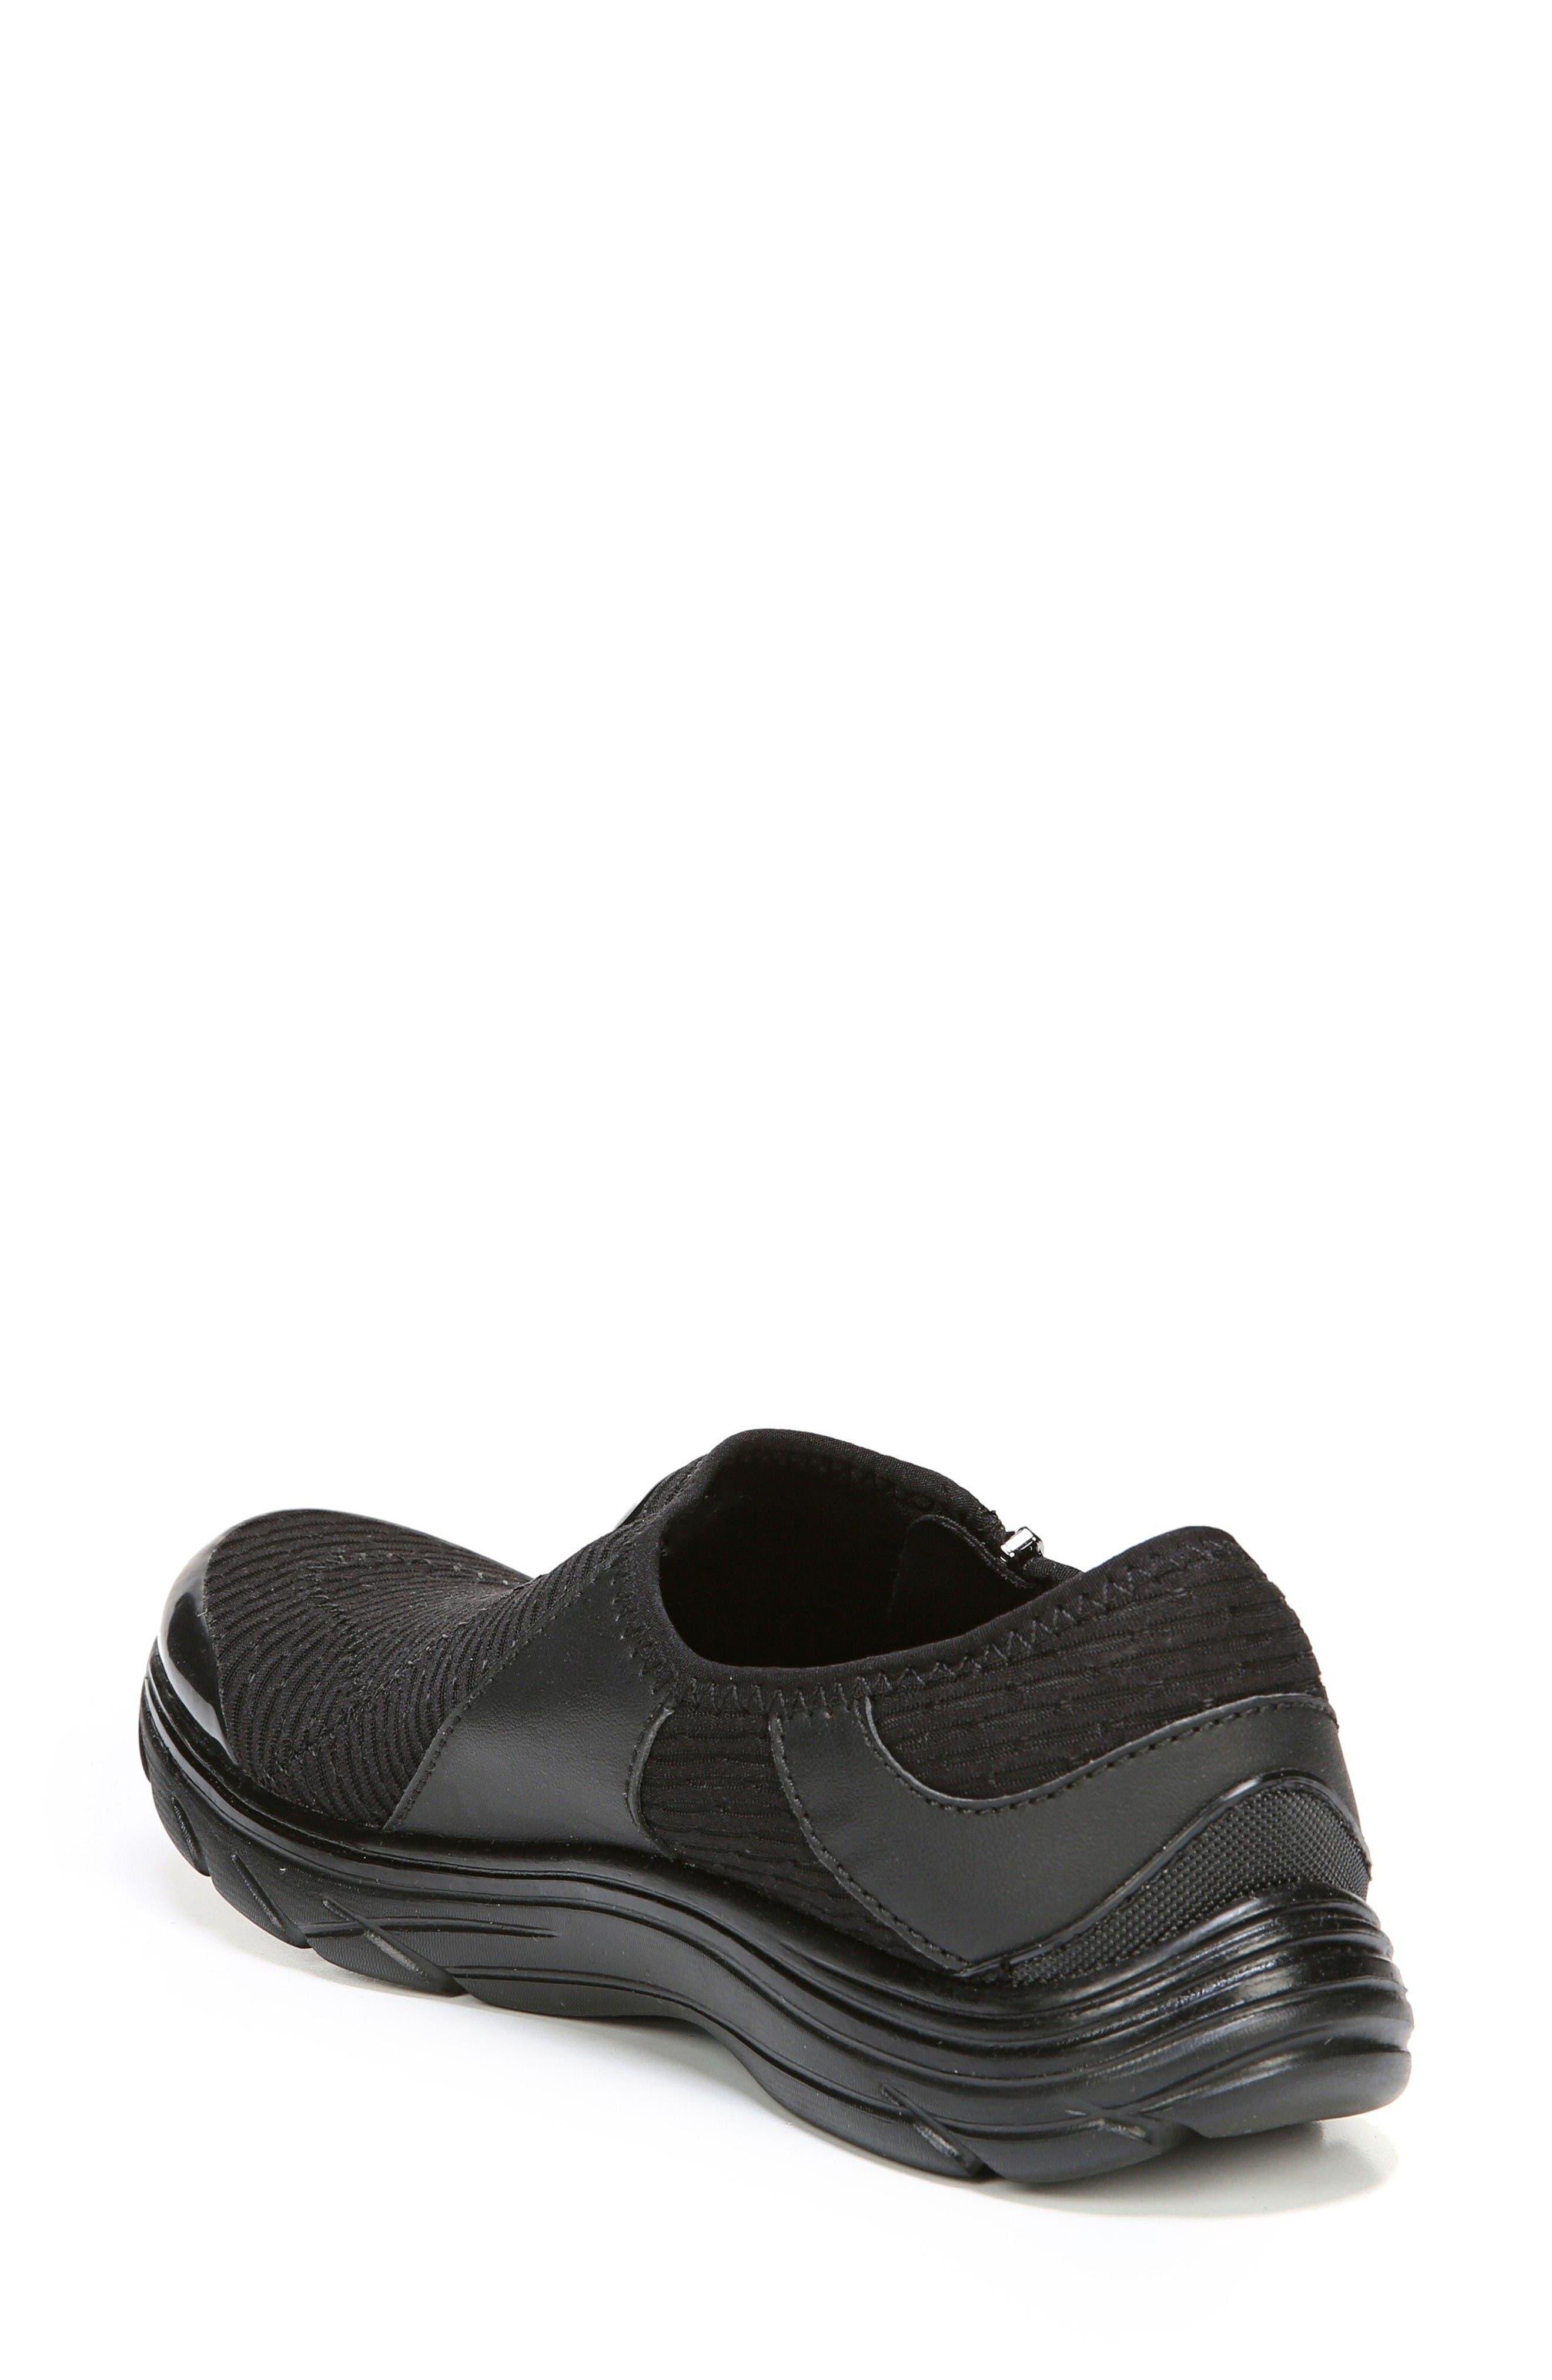 Balance Sneaker,                             Alternate thumbnail 2, color,                             Black Oval Fabric